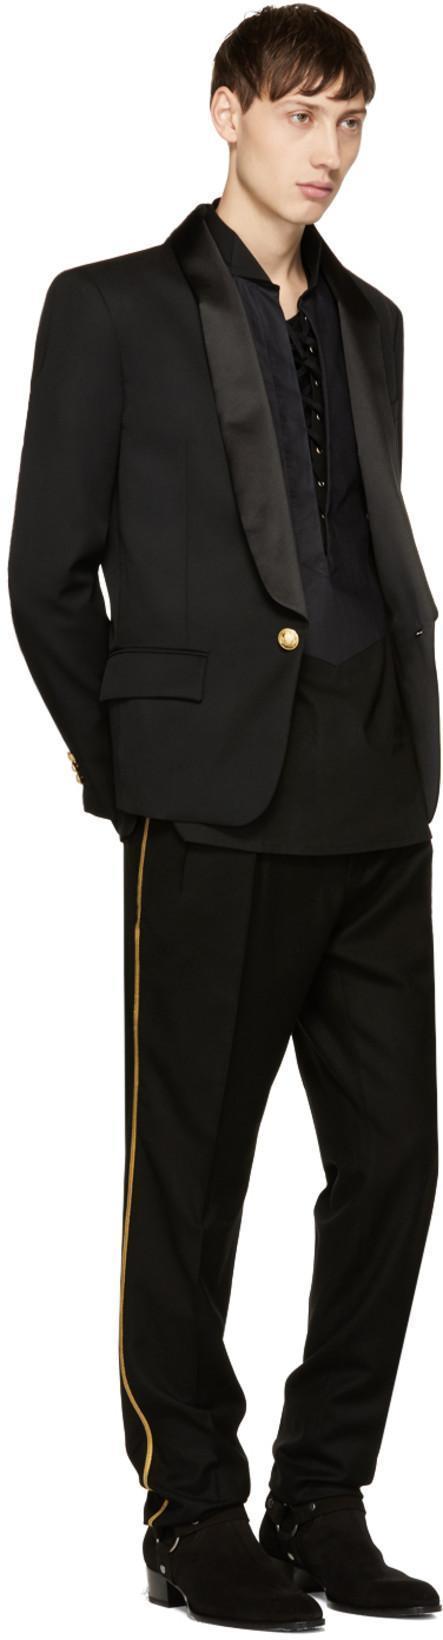 SAINT LAURENT Slim-Leg Side-Trimmed Wool Tuxedo Trousers, Black